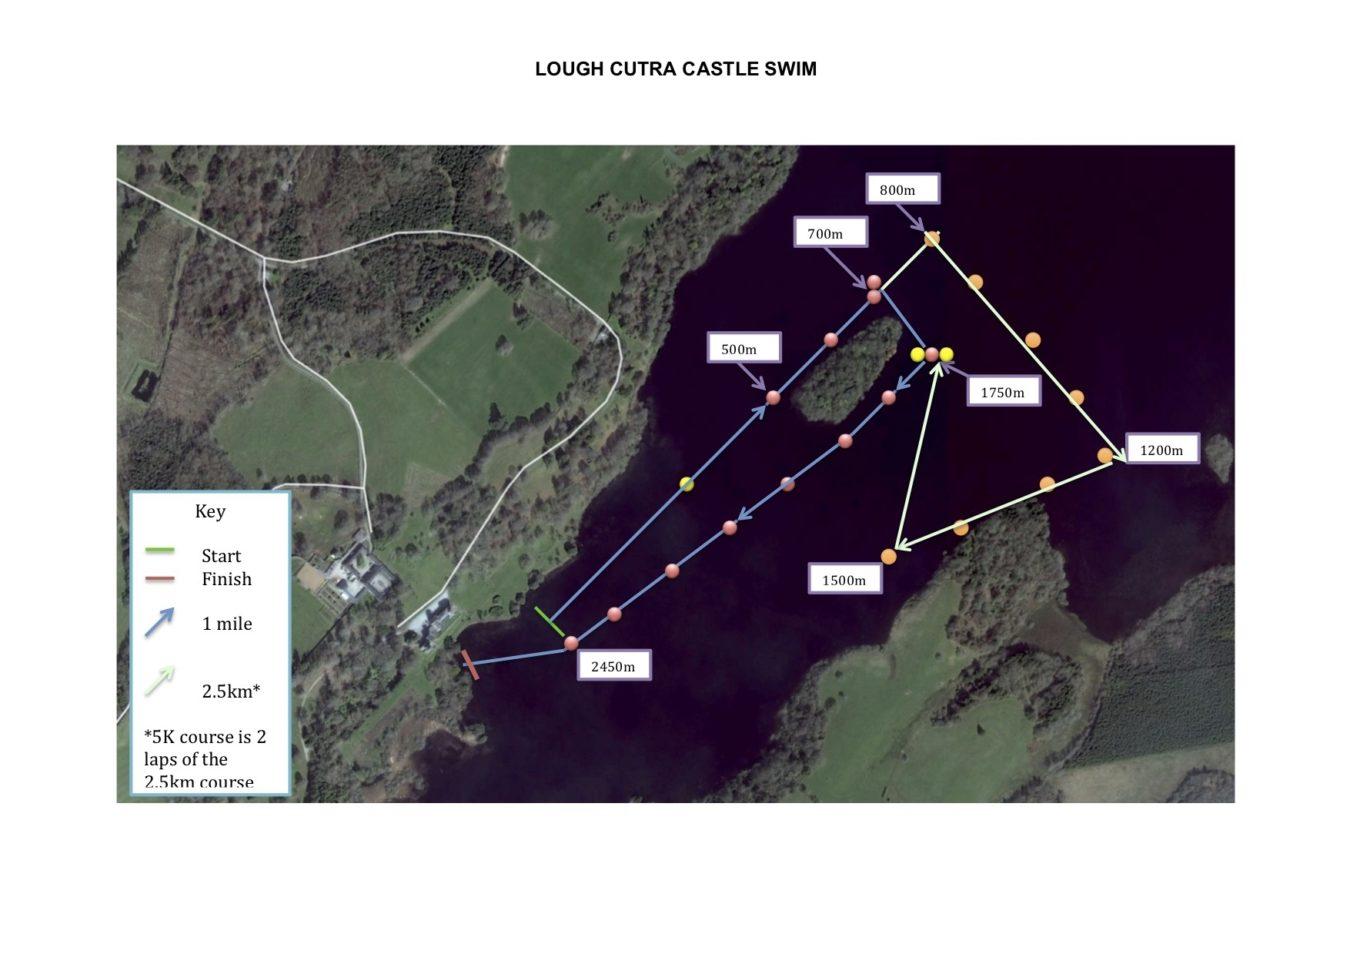 Lough Cutra Castle Swim